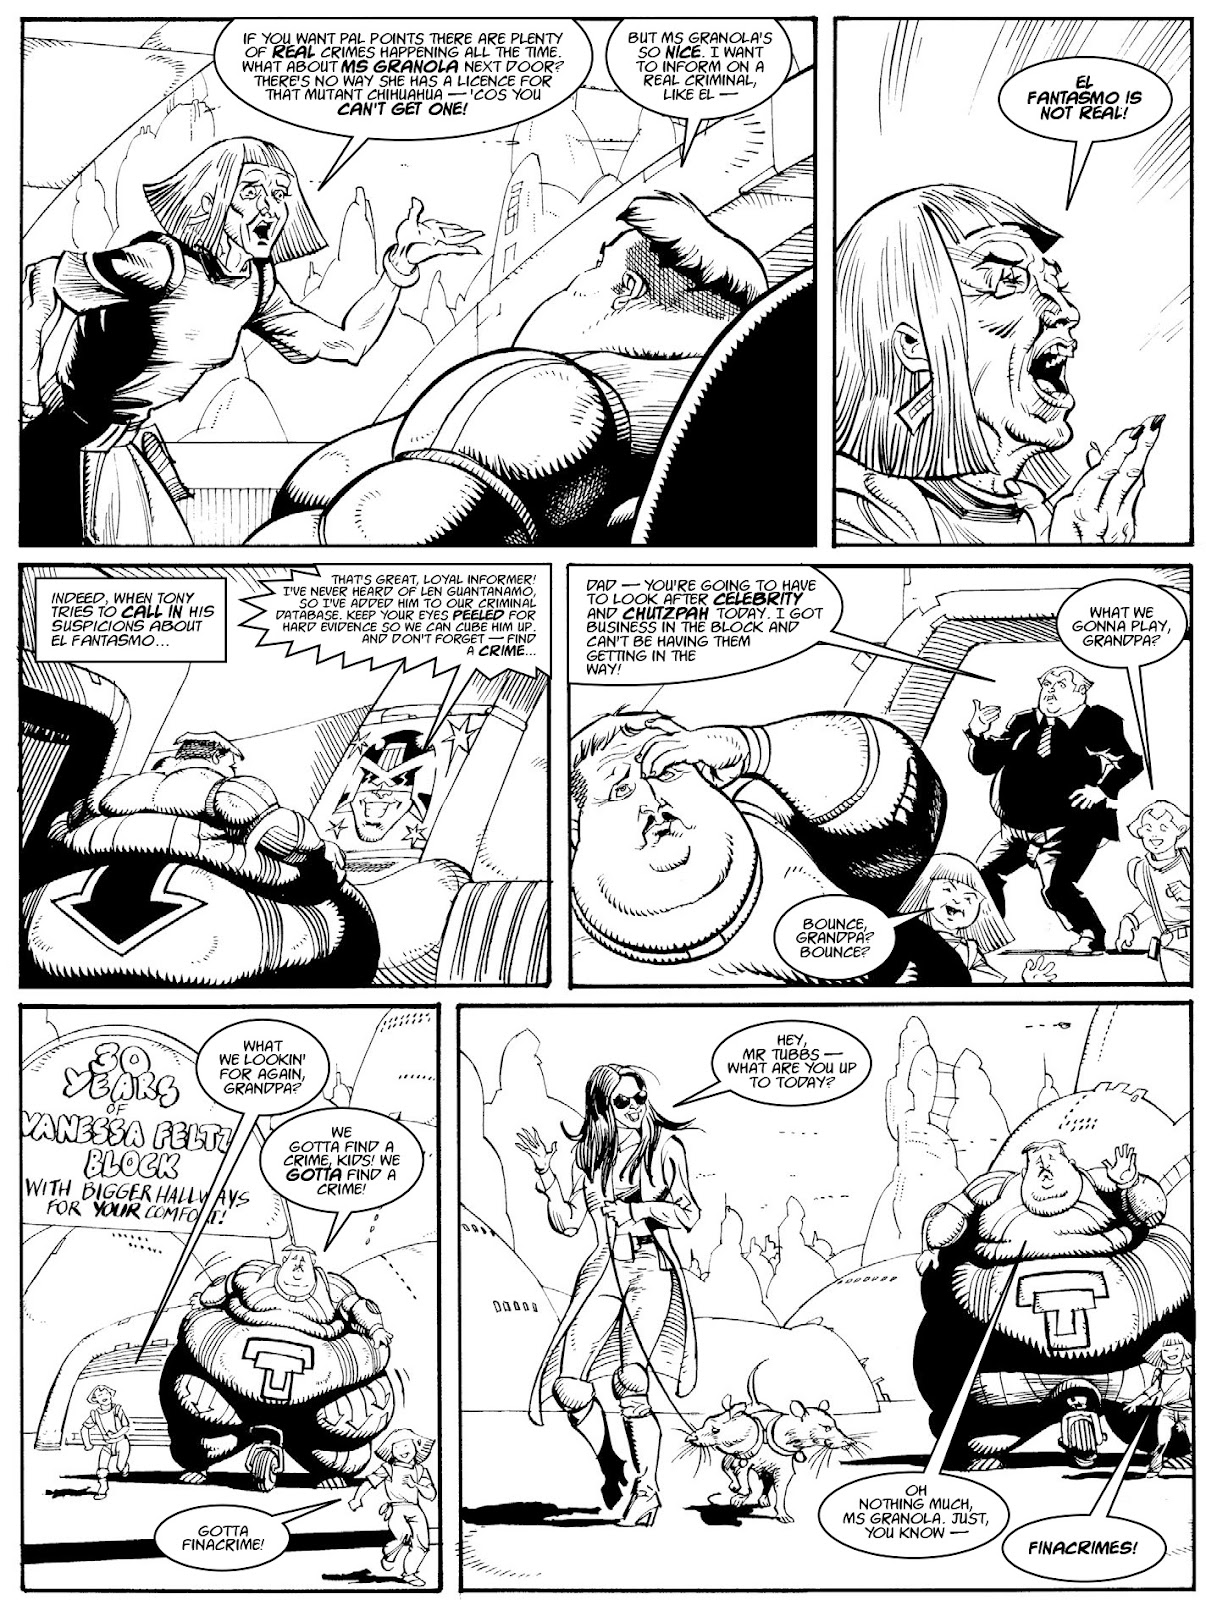 Judge Dredd Megazine (Vol. 5) issue 427 - Page 123